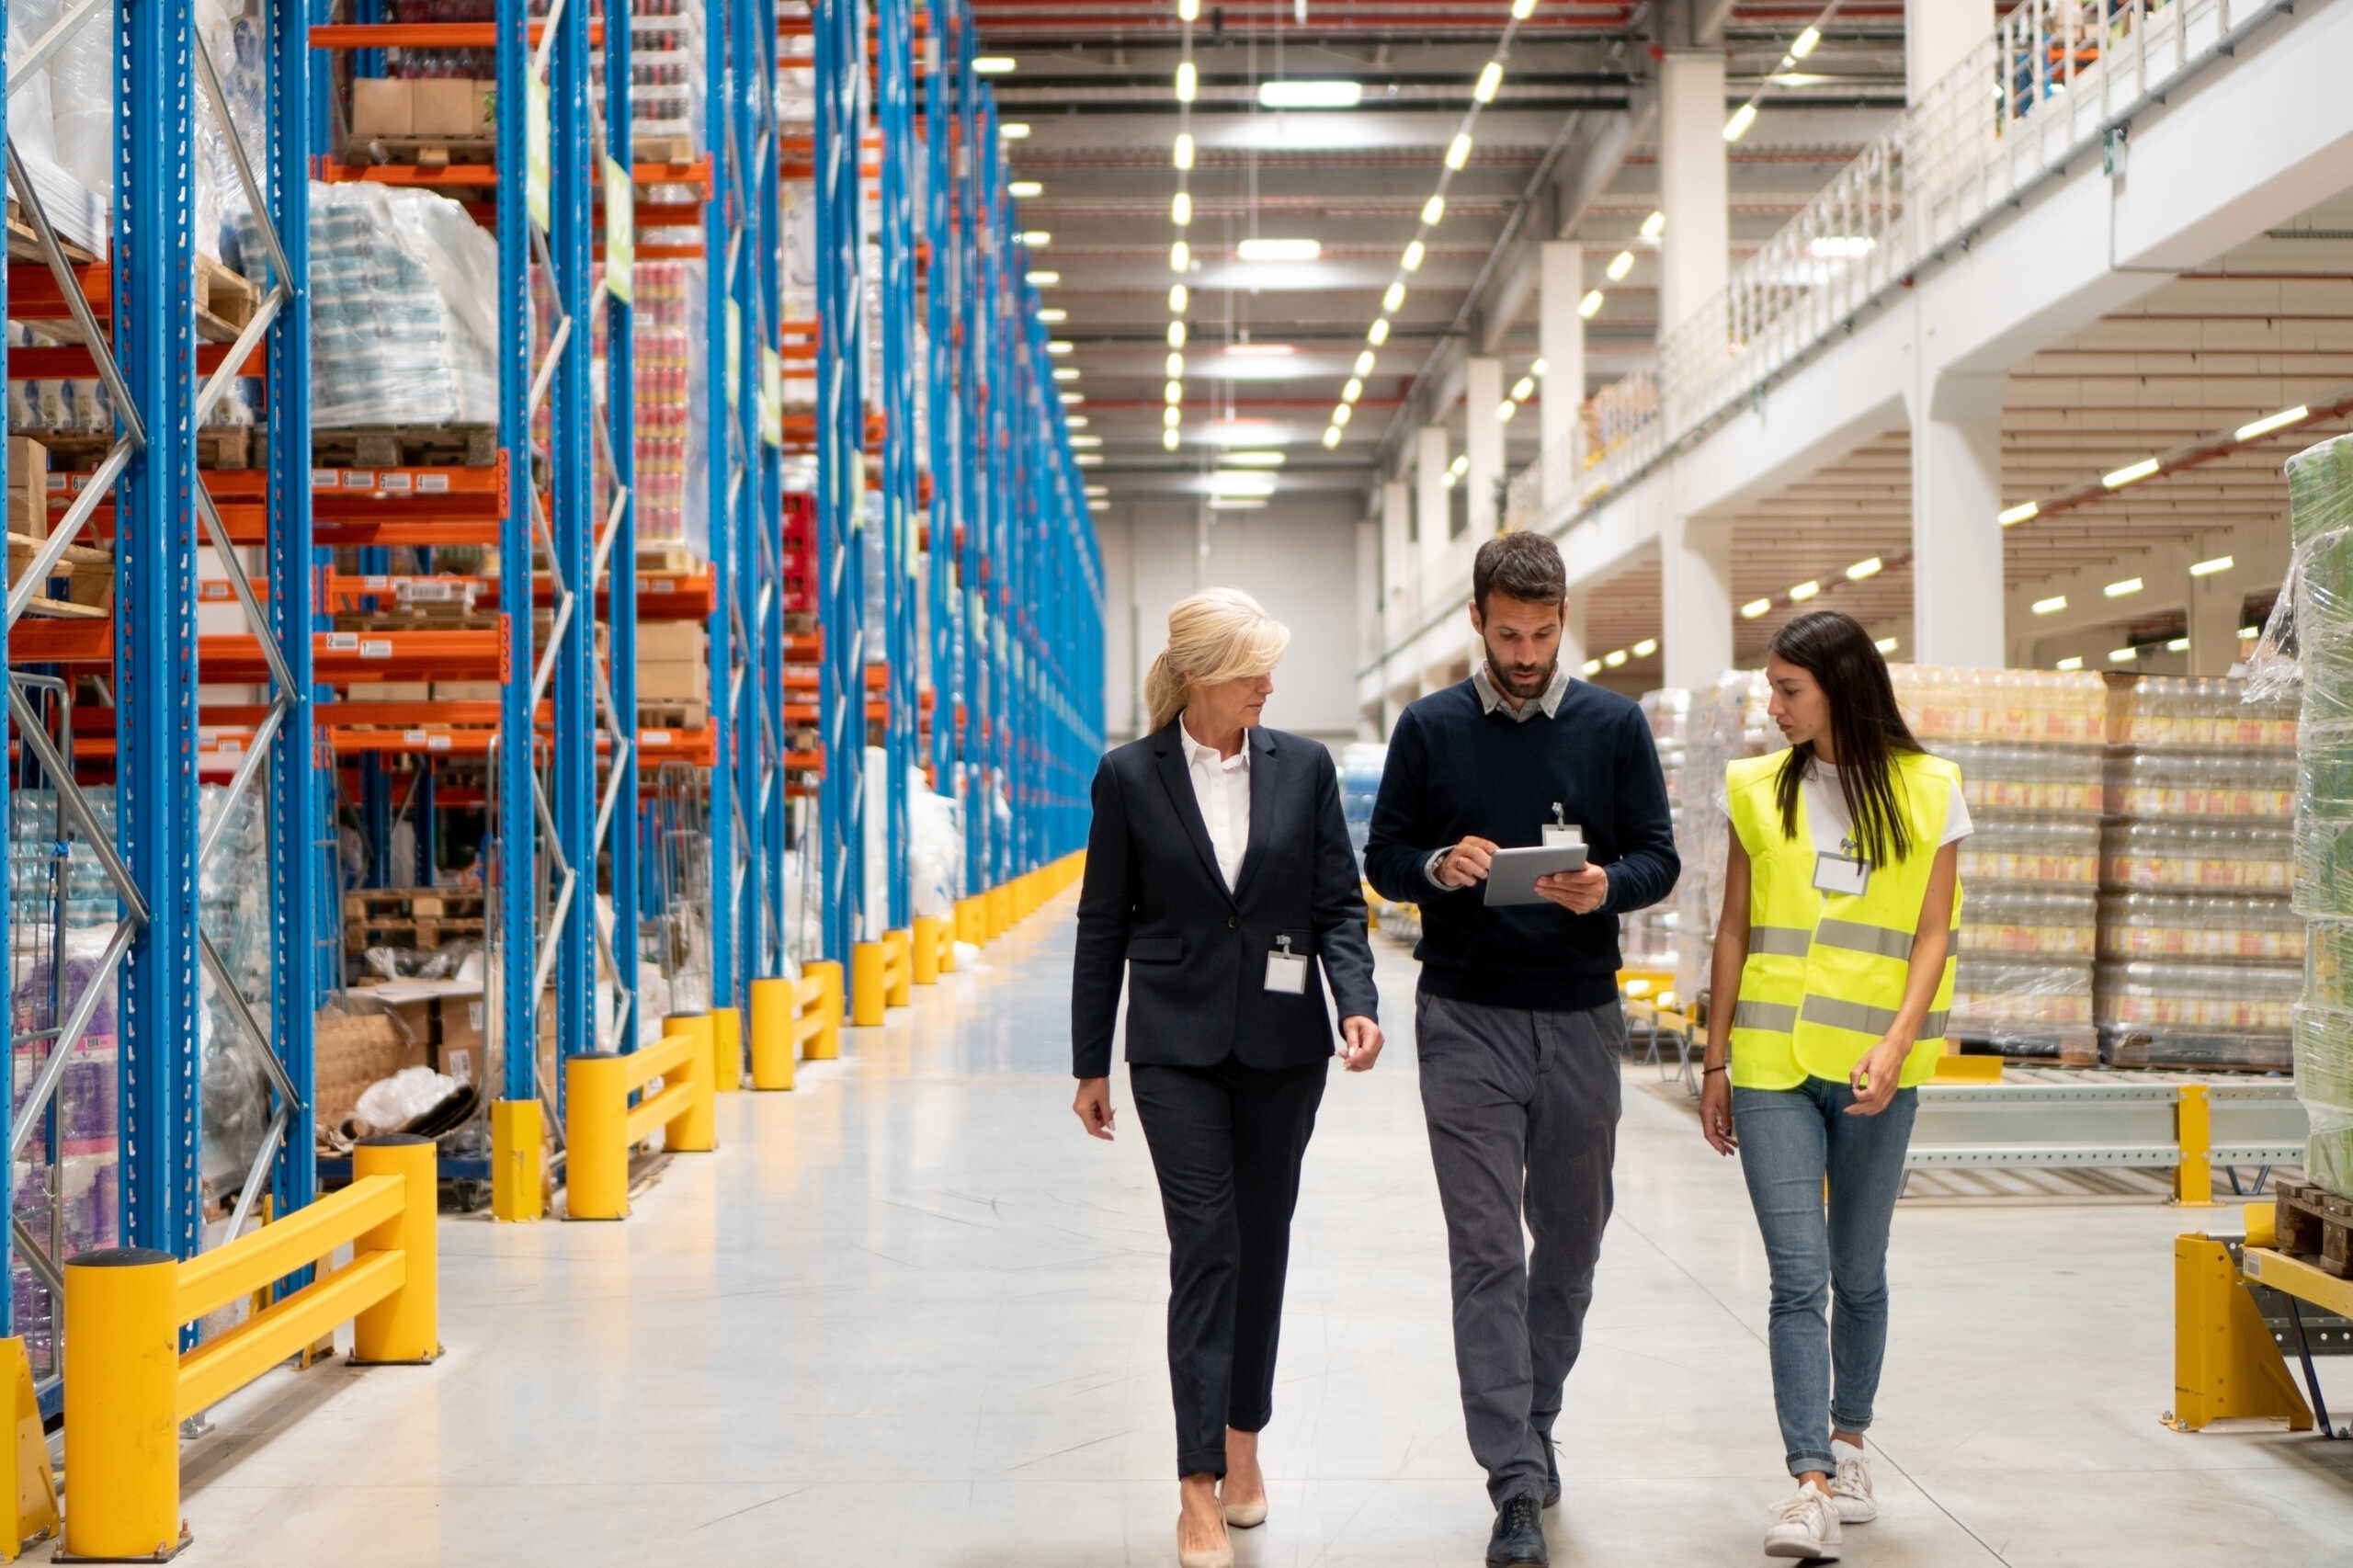 Cleveland warehousing